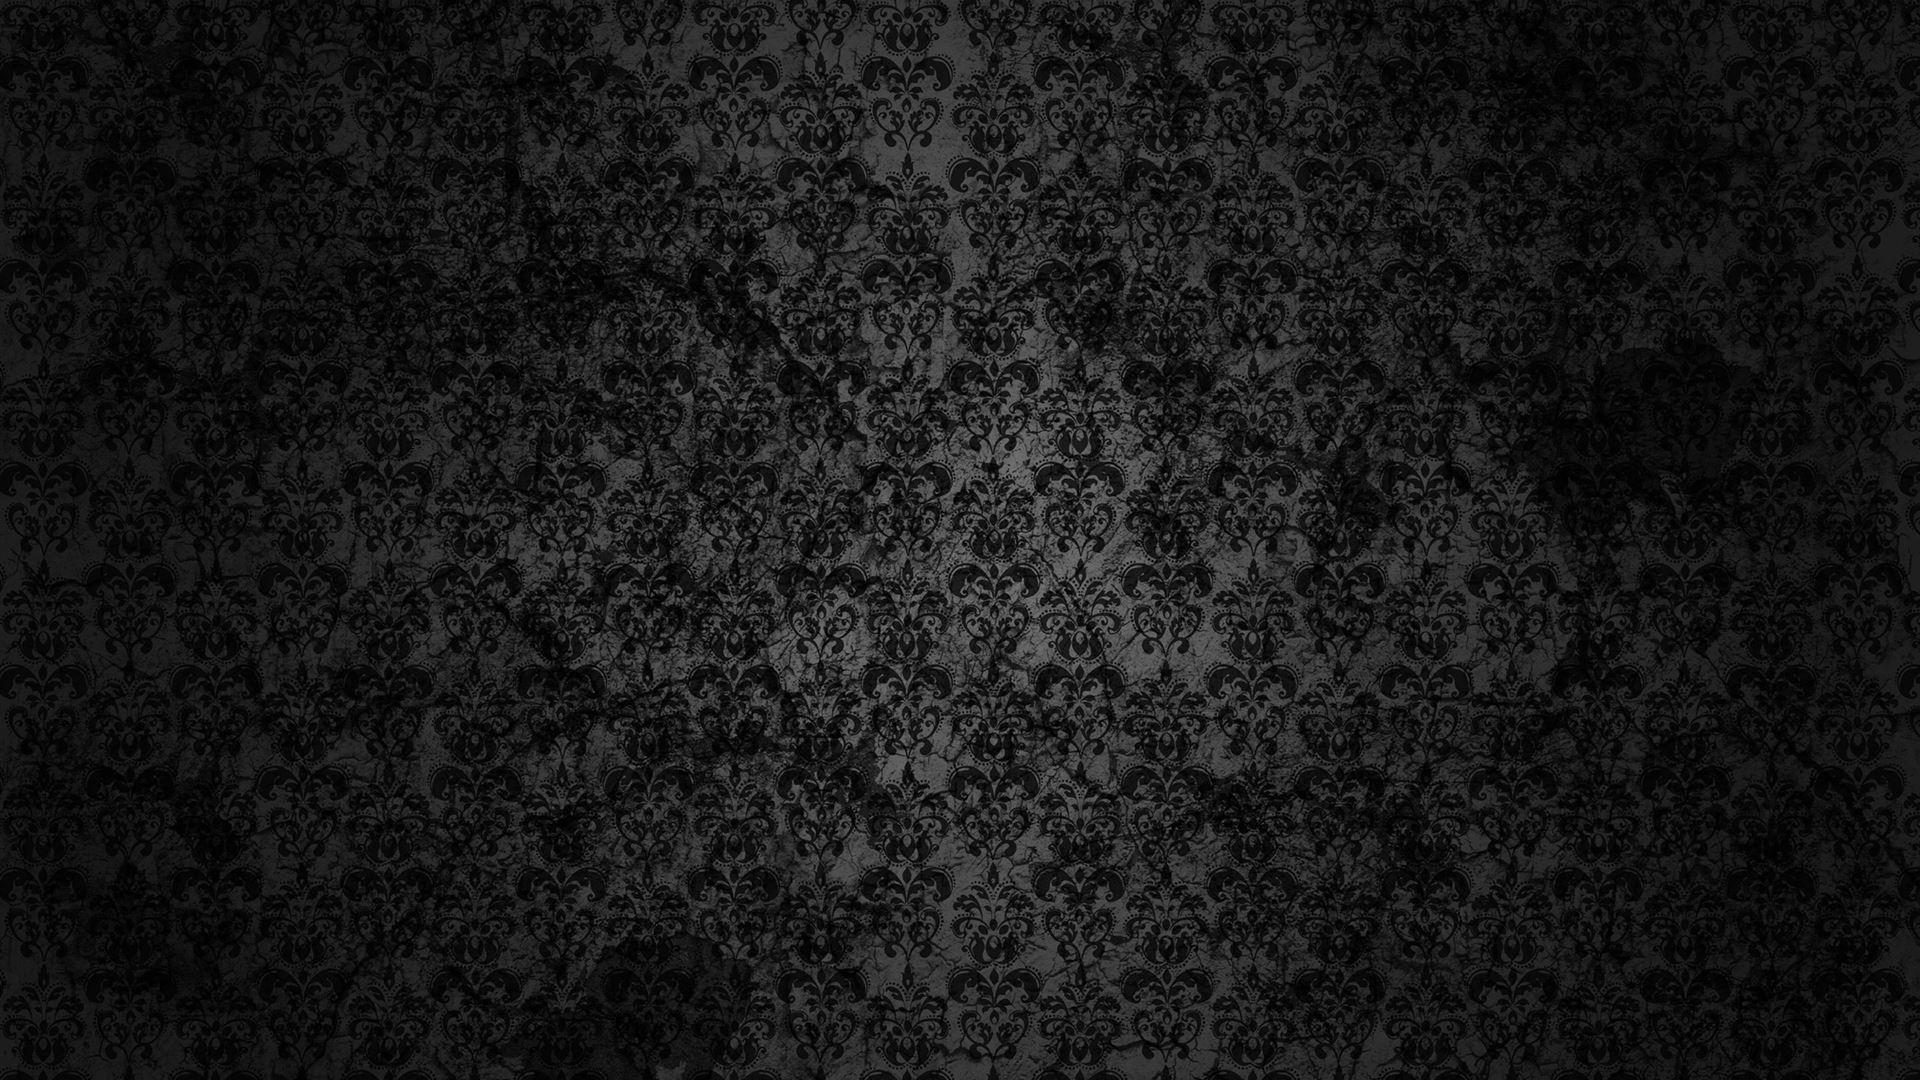 Black Floral Grunge Mac Wallpaper Download Allmacwallpaper